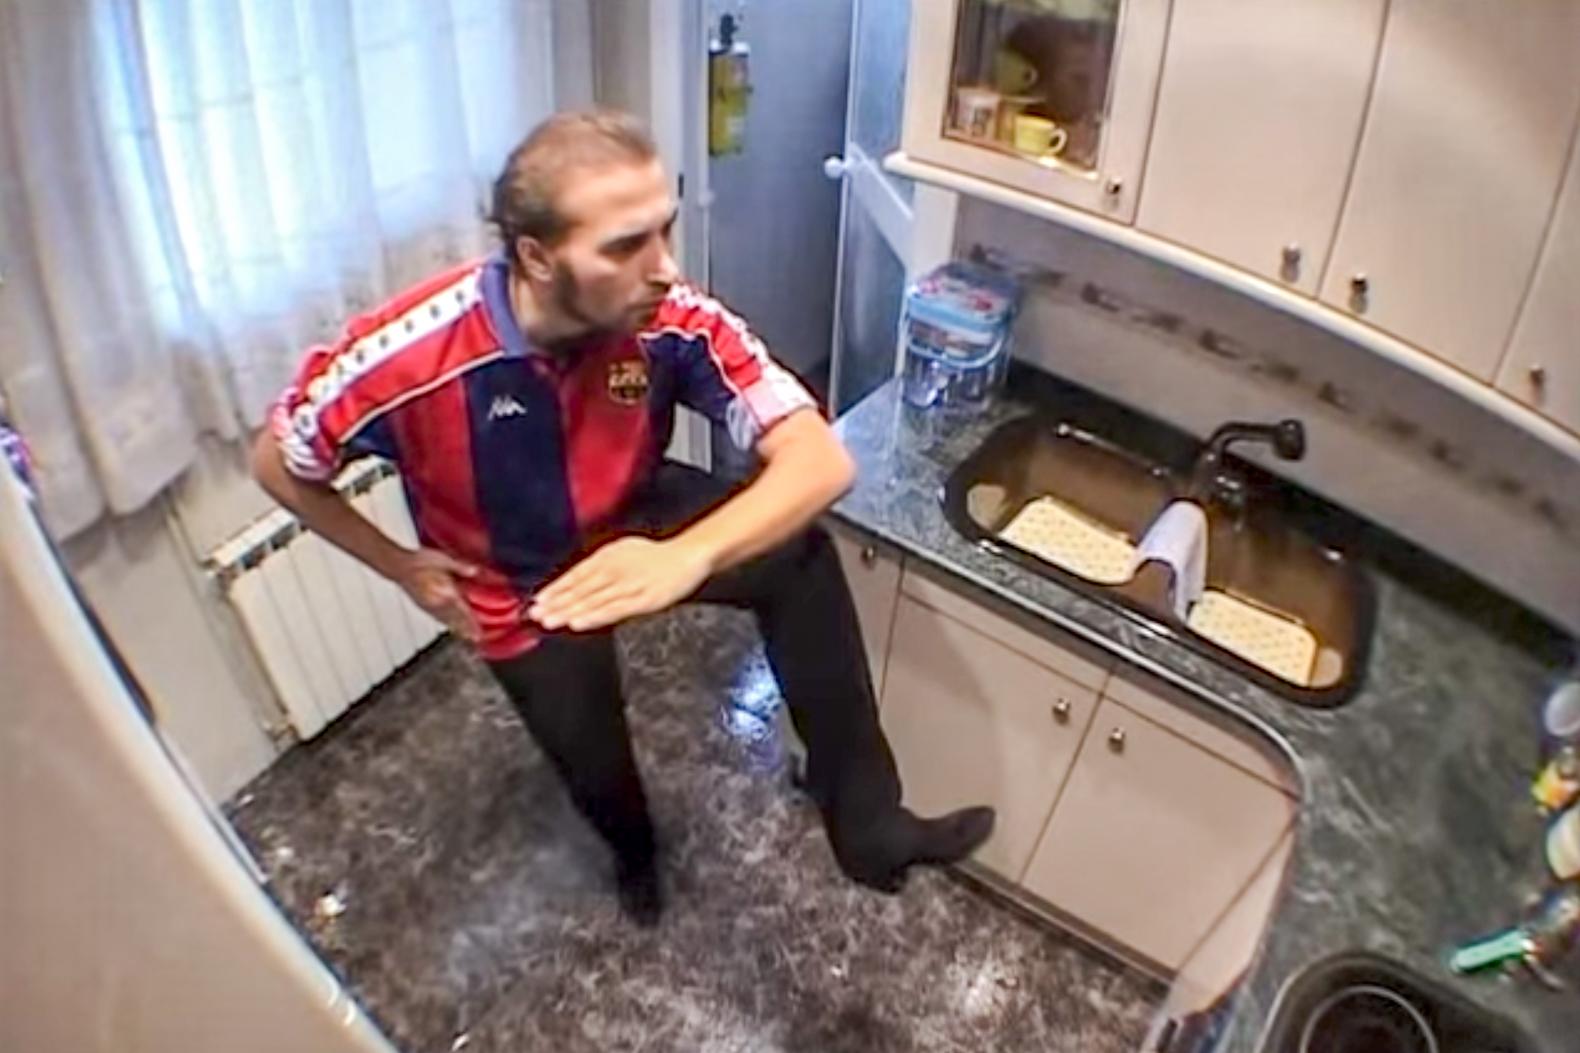 Pedro G. Romero, La Casa, 2005, video still.